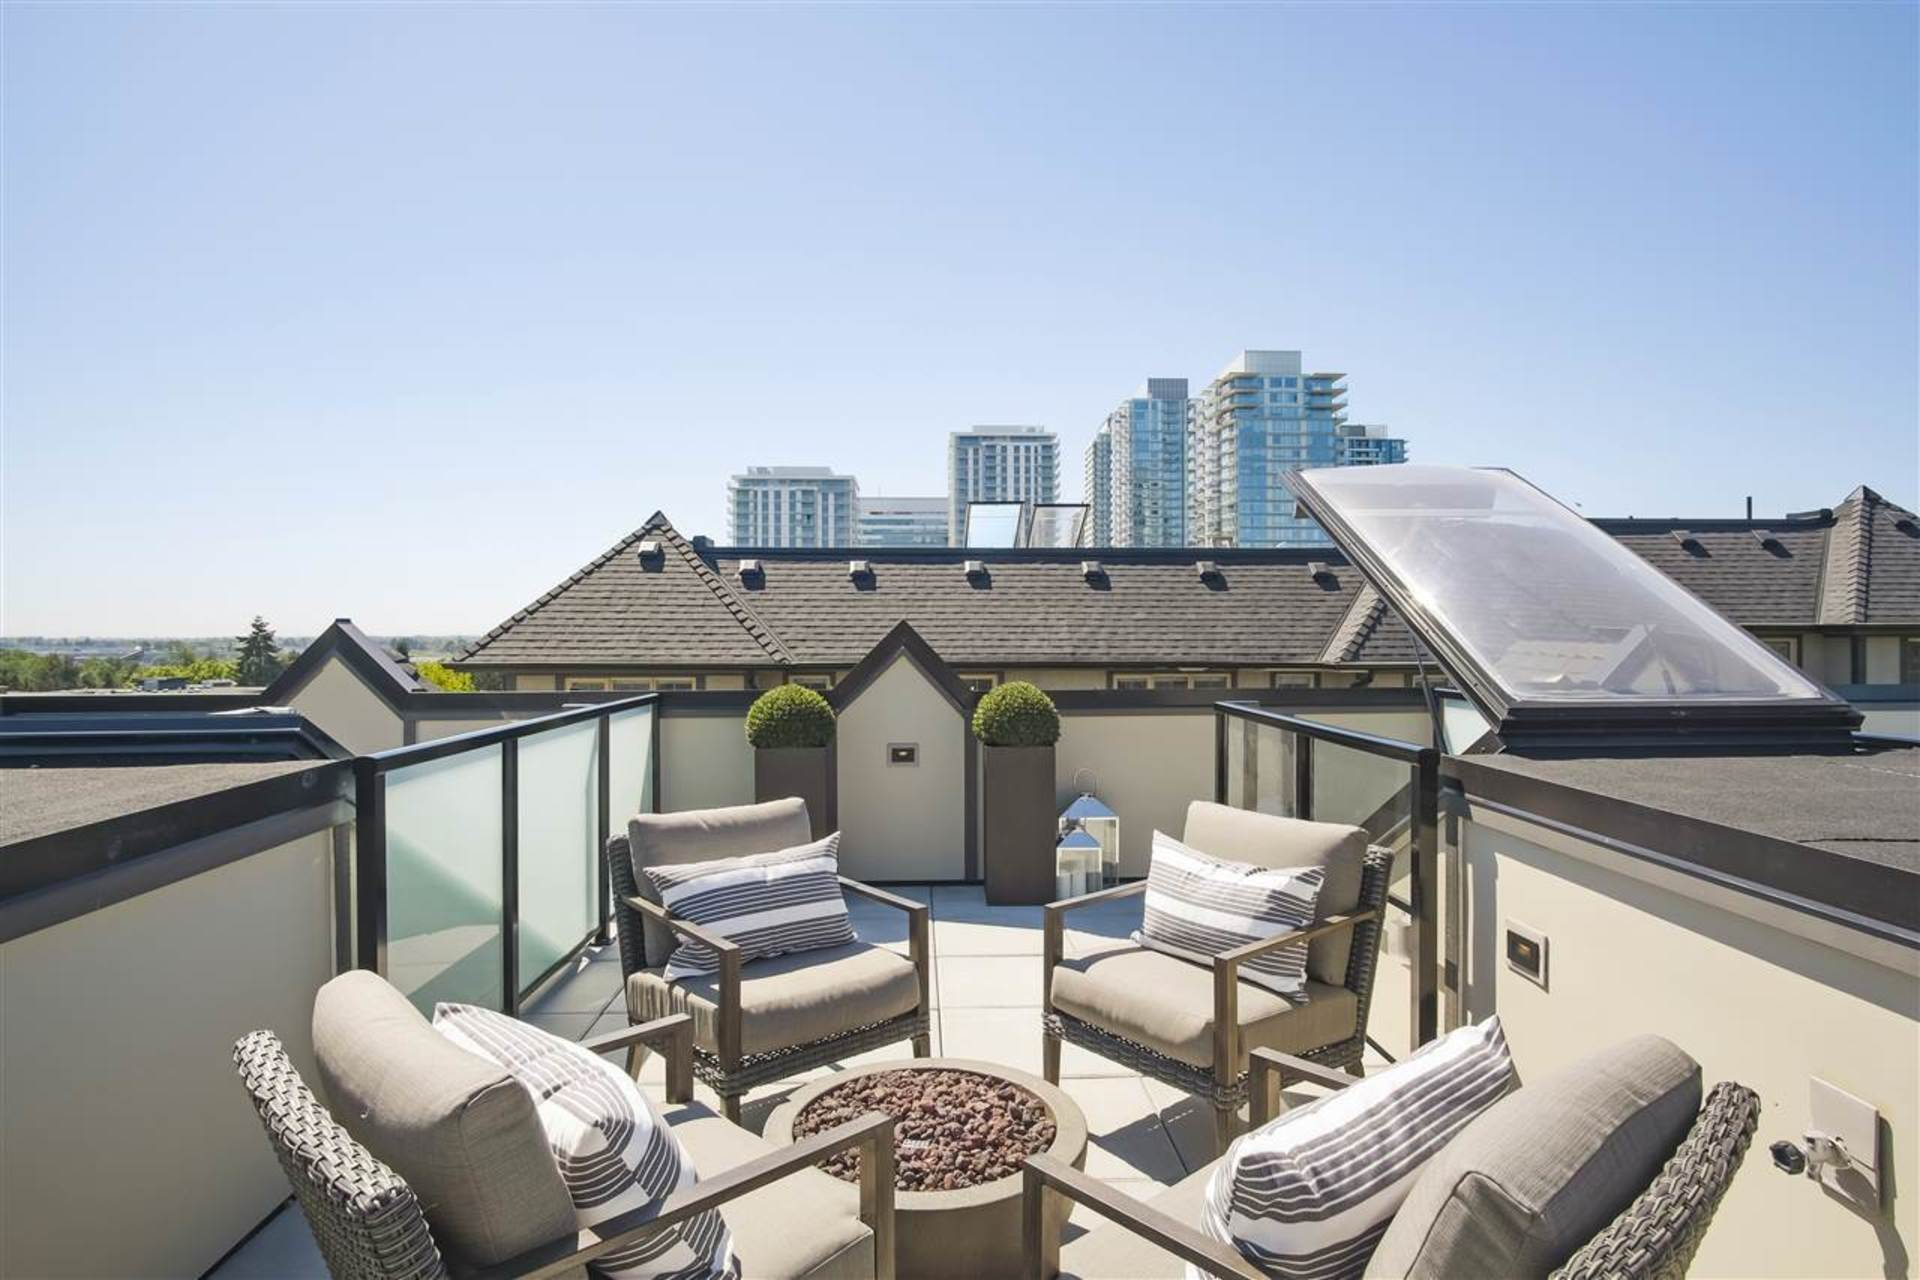 443-w-63-avenue-marpole-vancouver-west-17 at SL3 - 443 W 63 Avenue, Marpole, Vancouver West